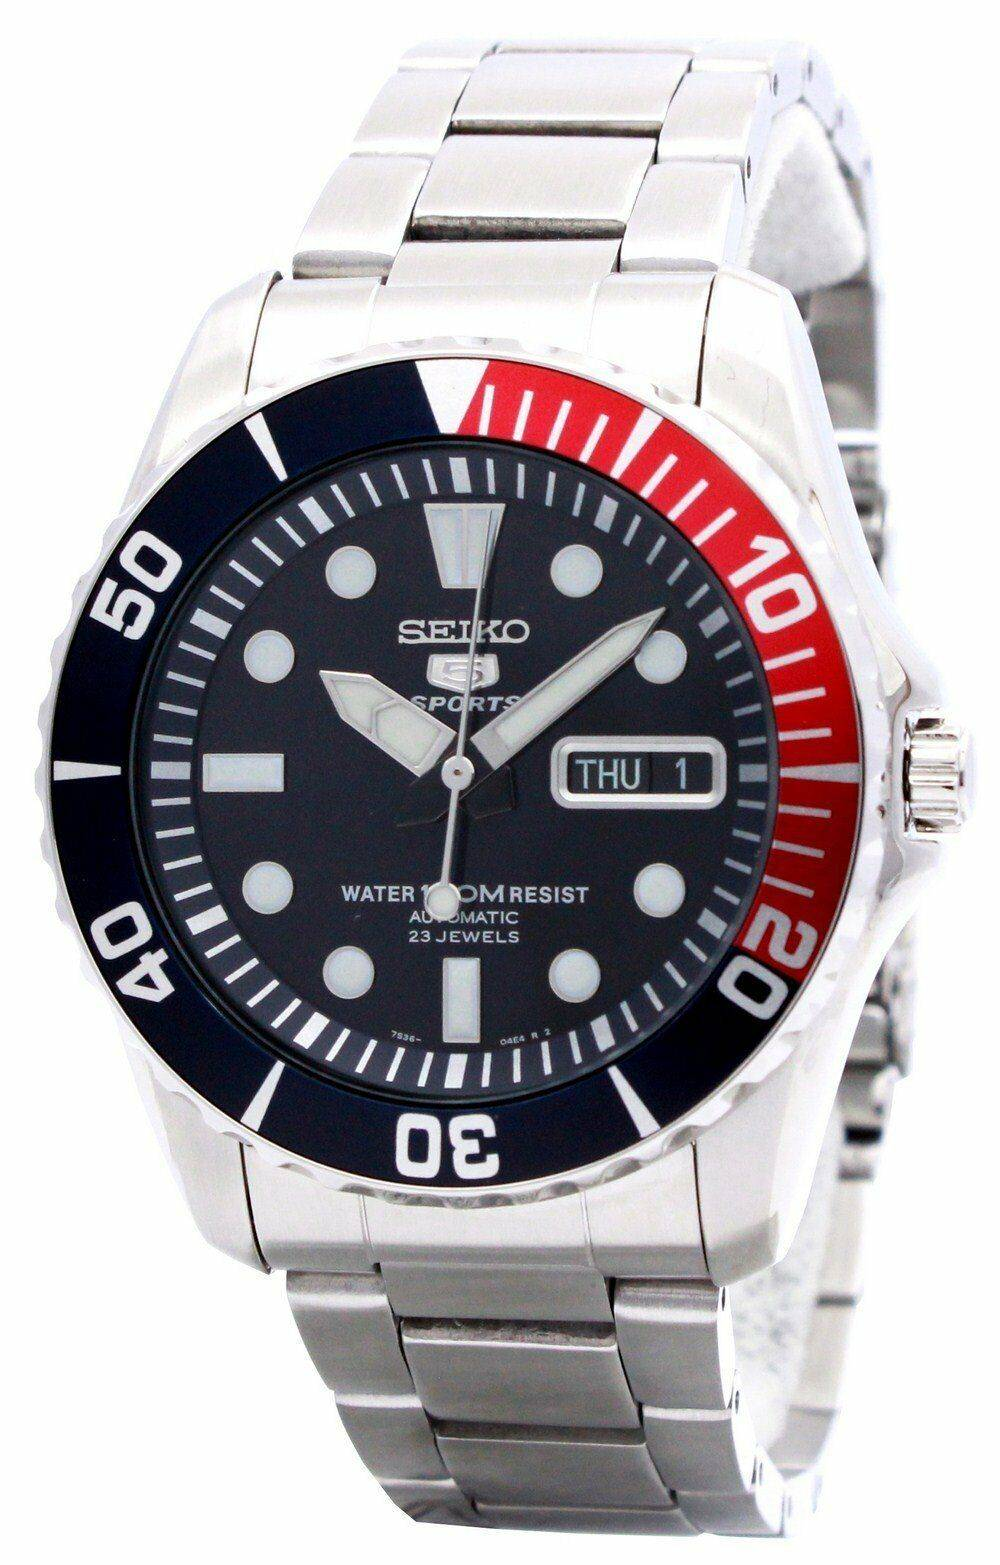 bee5096221a5 Detalles acerca de Seiko automático divers 23 joyas 100M Snzf 15K1 Snzf 15K  Hombre Reloj- mostrar título original